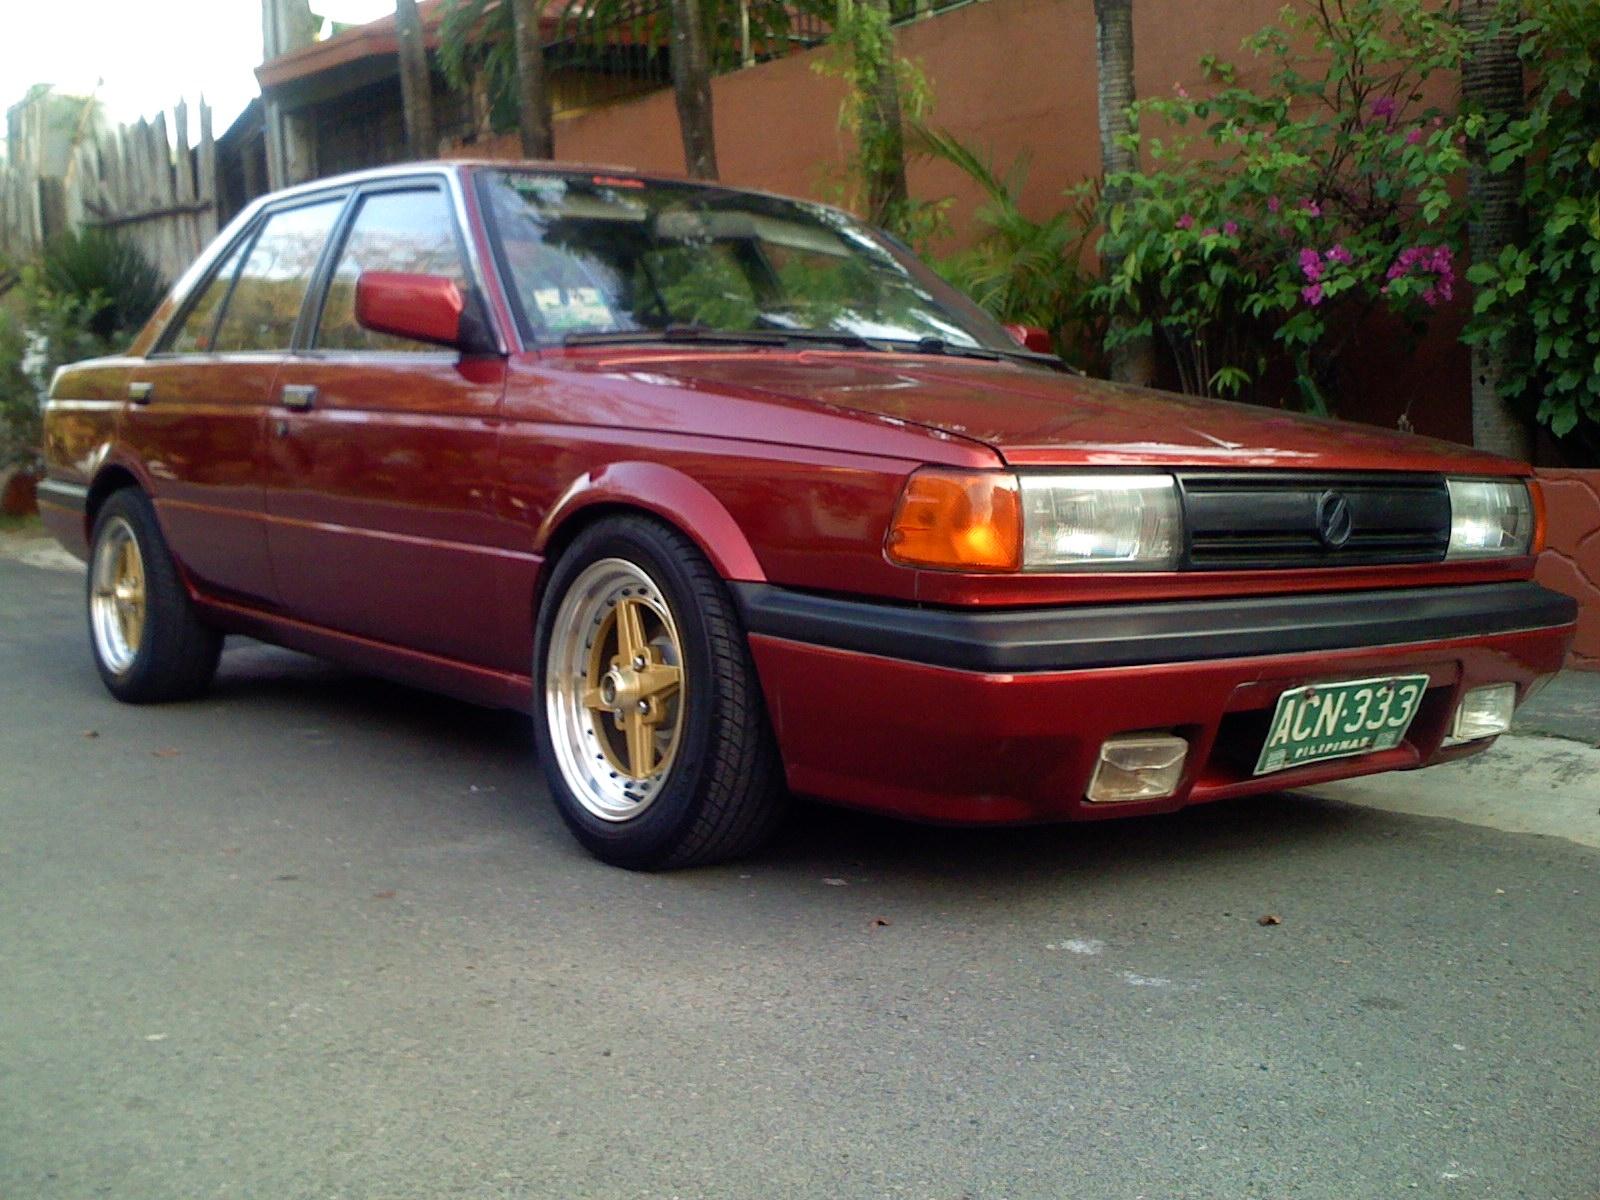 1990 Nissan Sentra - Information and photos - Zomb Drive